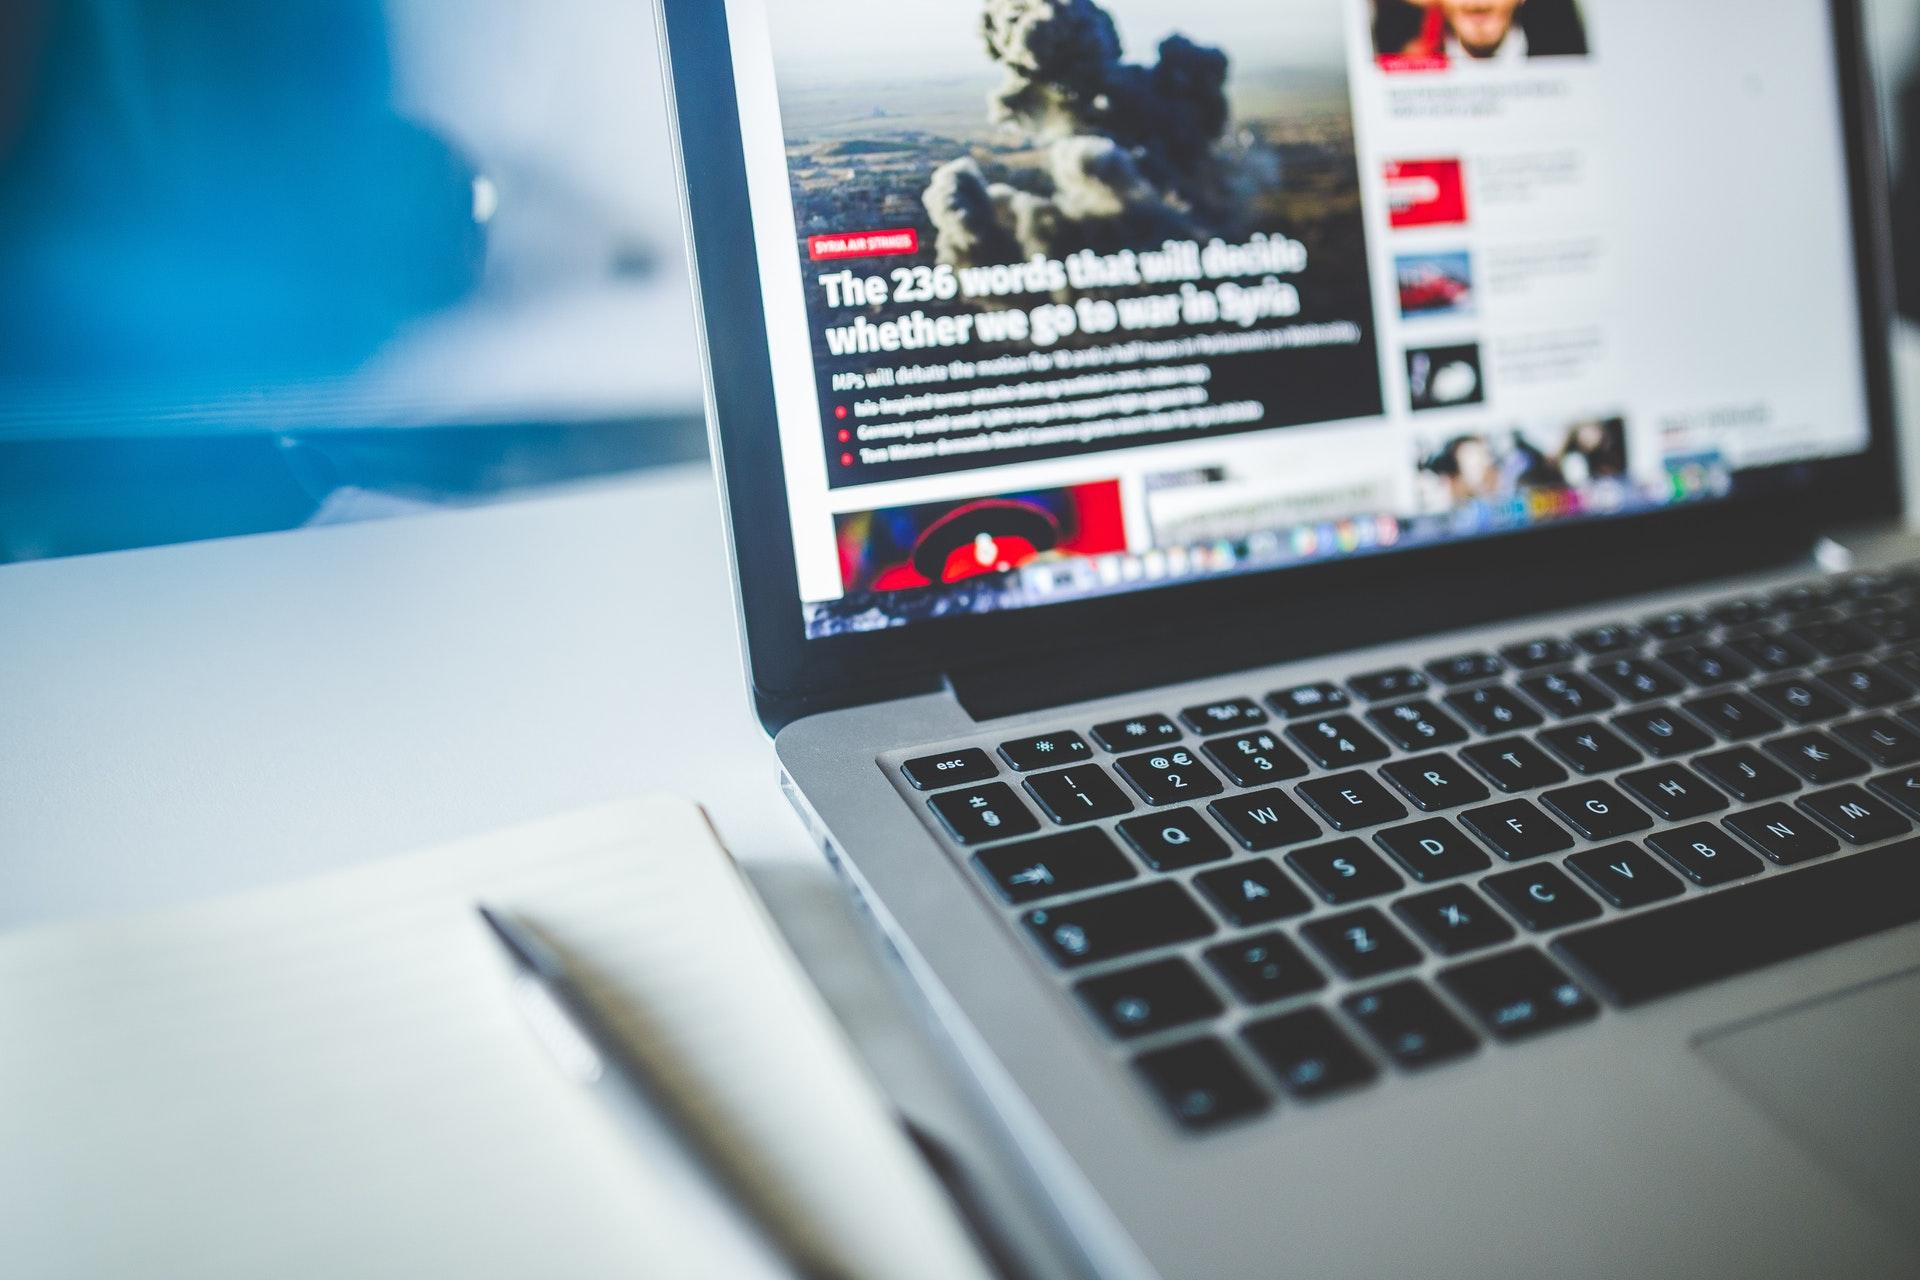 News website on gray laptop next to journal